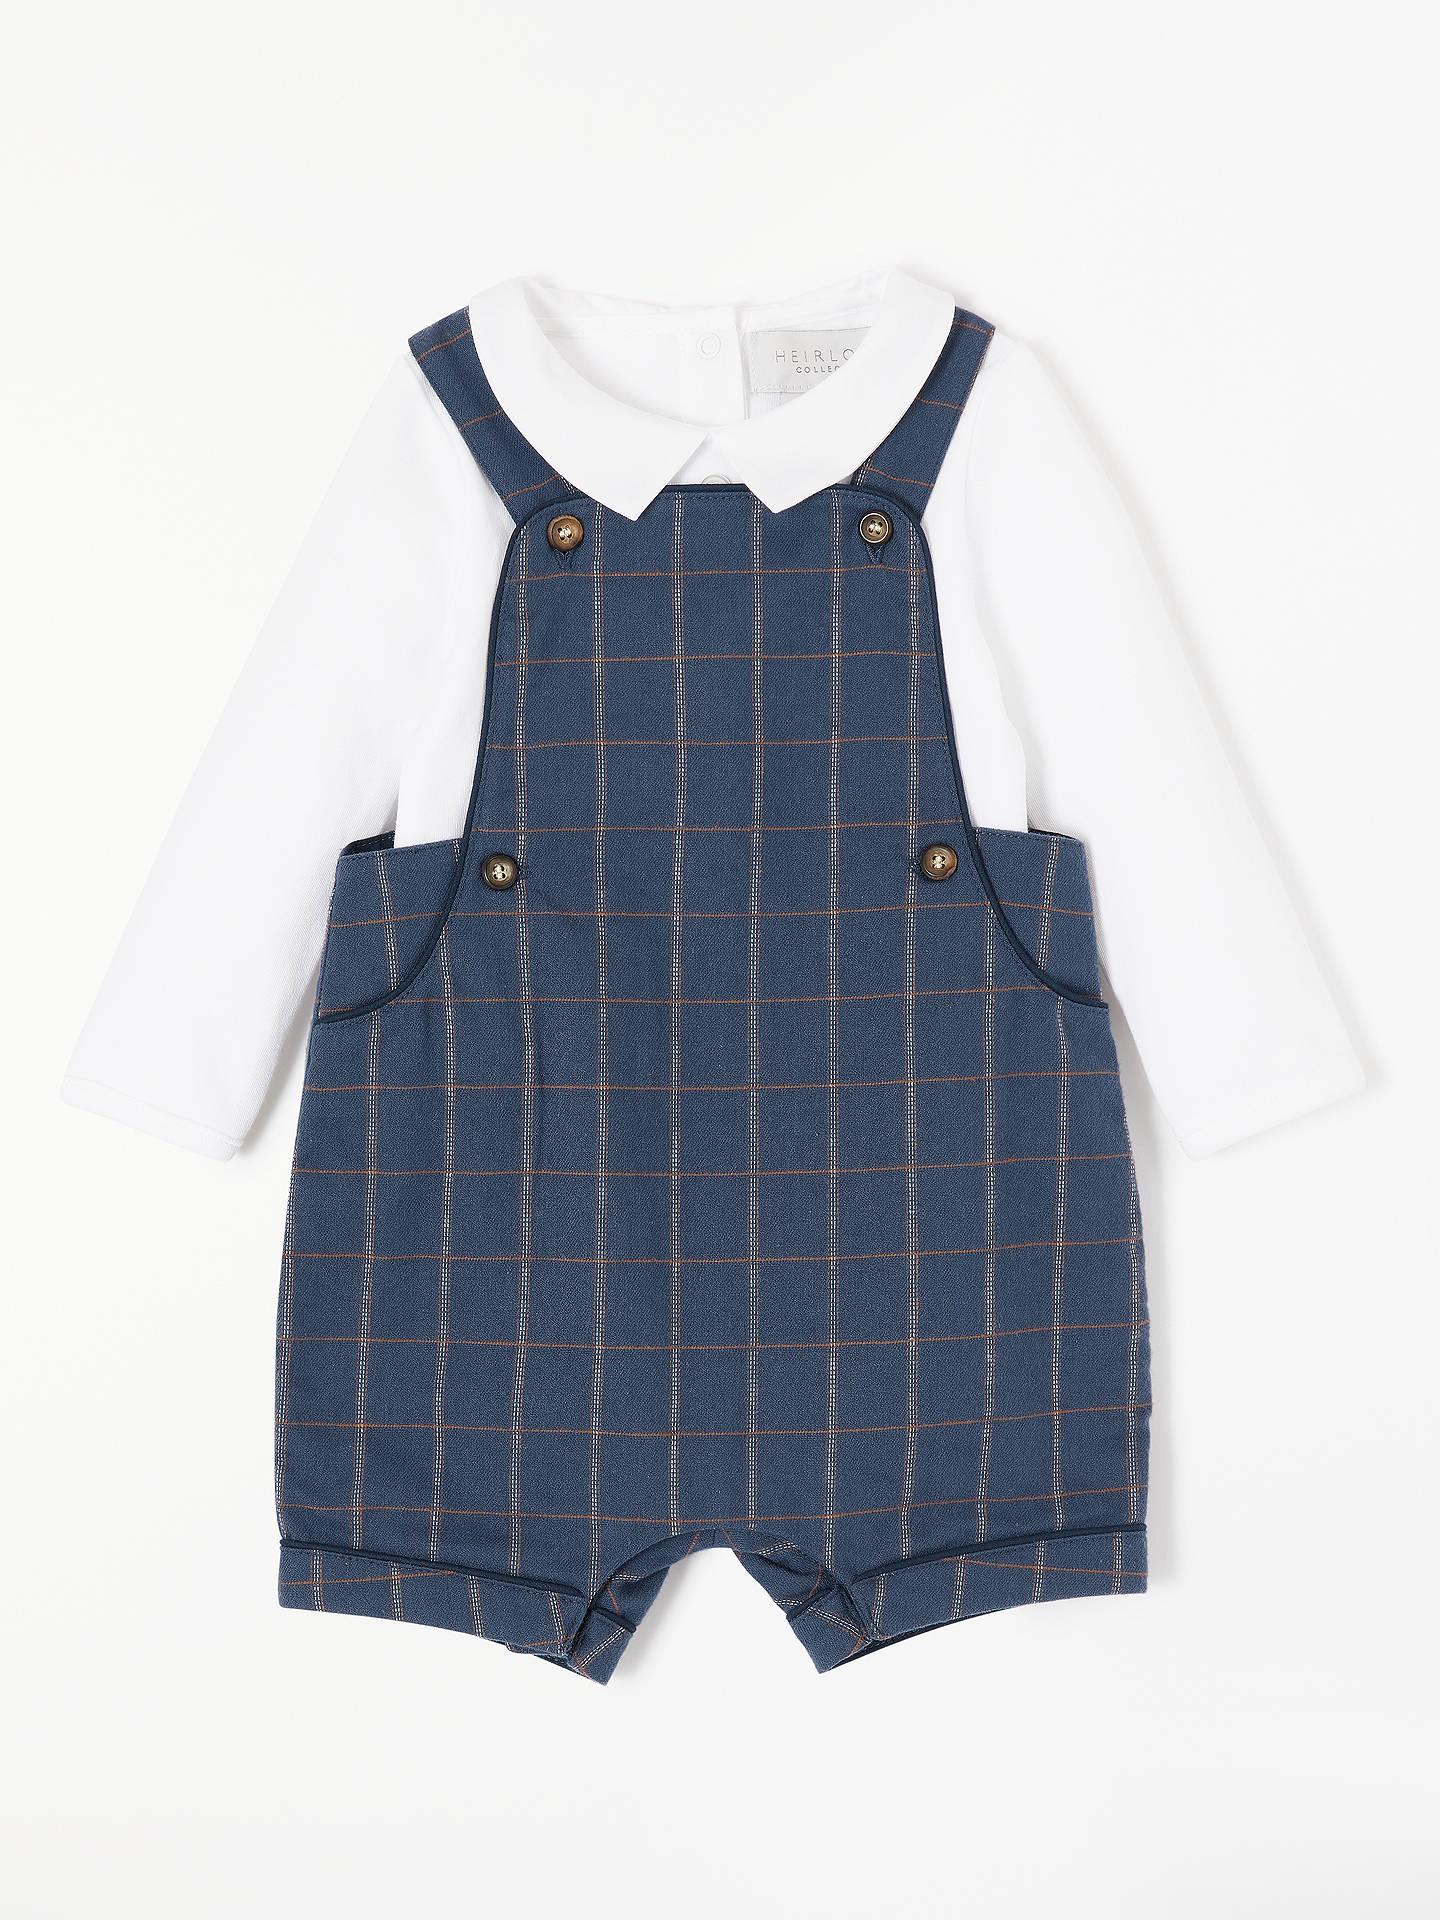 Grey 2-3 Years New John Lewis Heirloom Collection Baby Shirt /& Dungaree Set